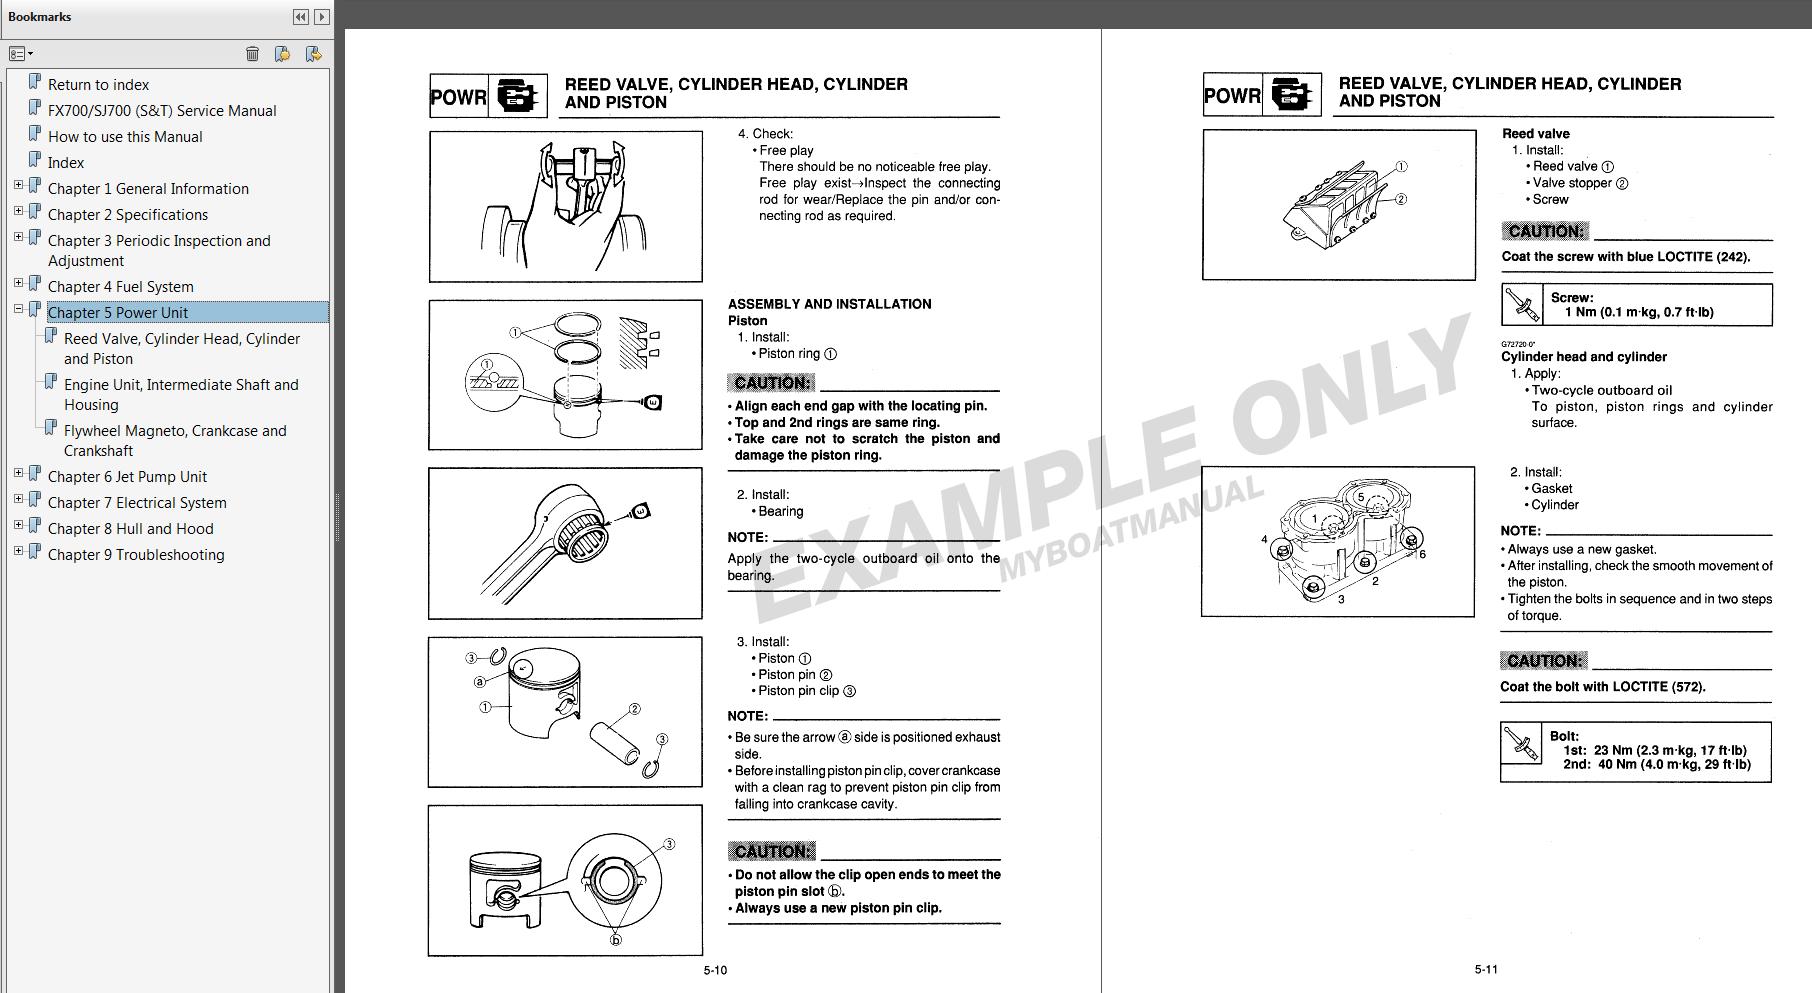 94 yamaha waverunner iii service manual